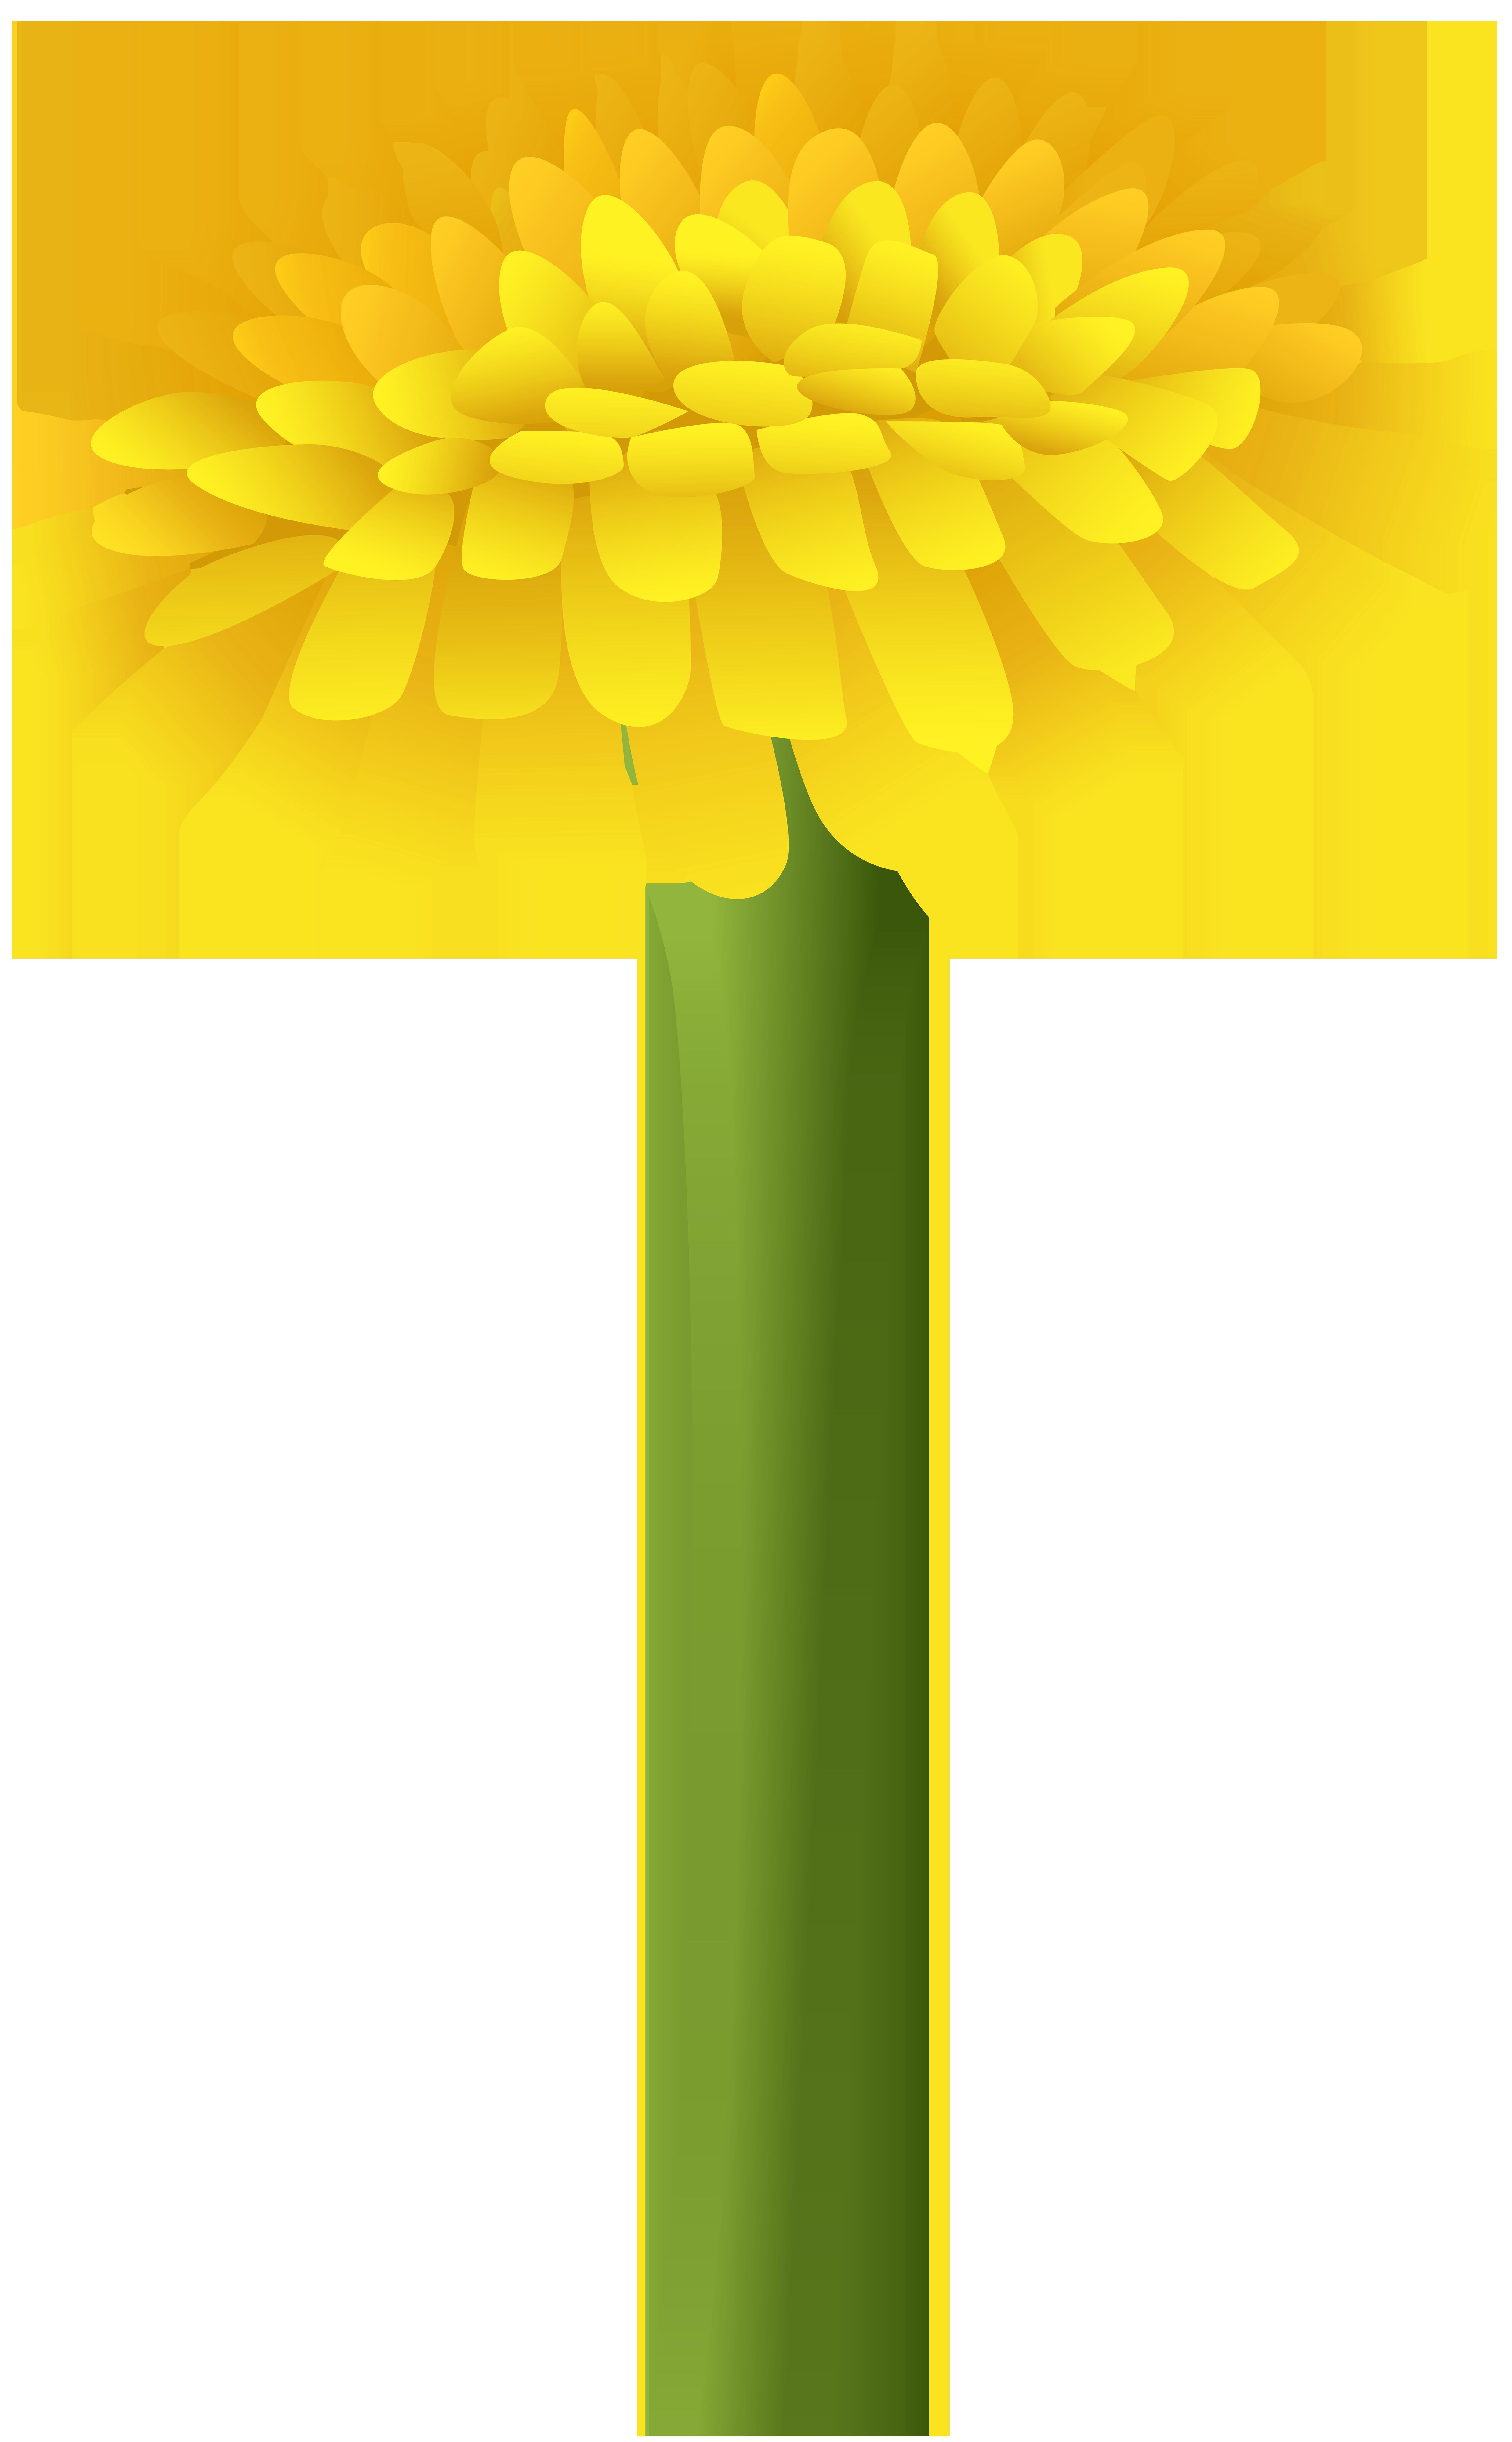 svg download Png clip art image. Dandelion clipart.